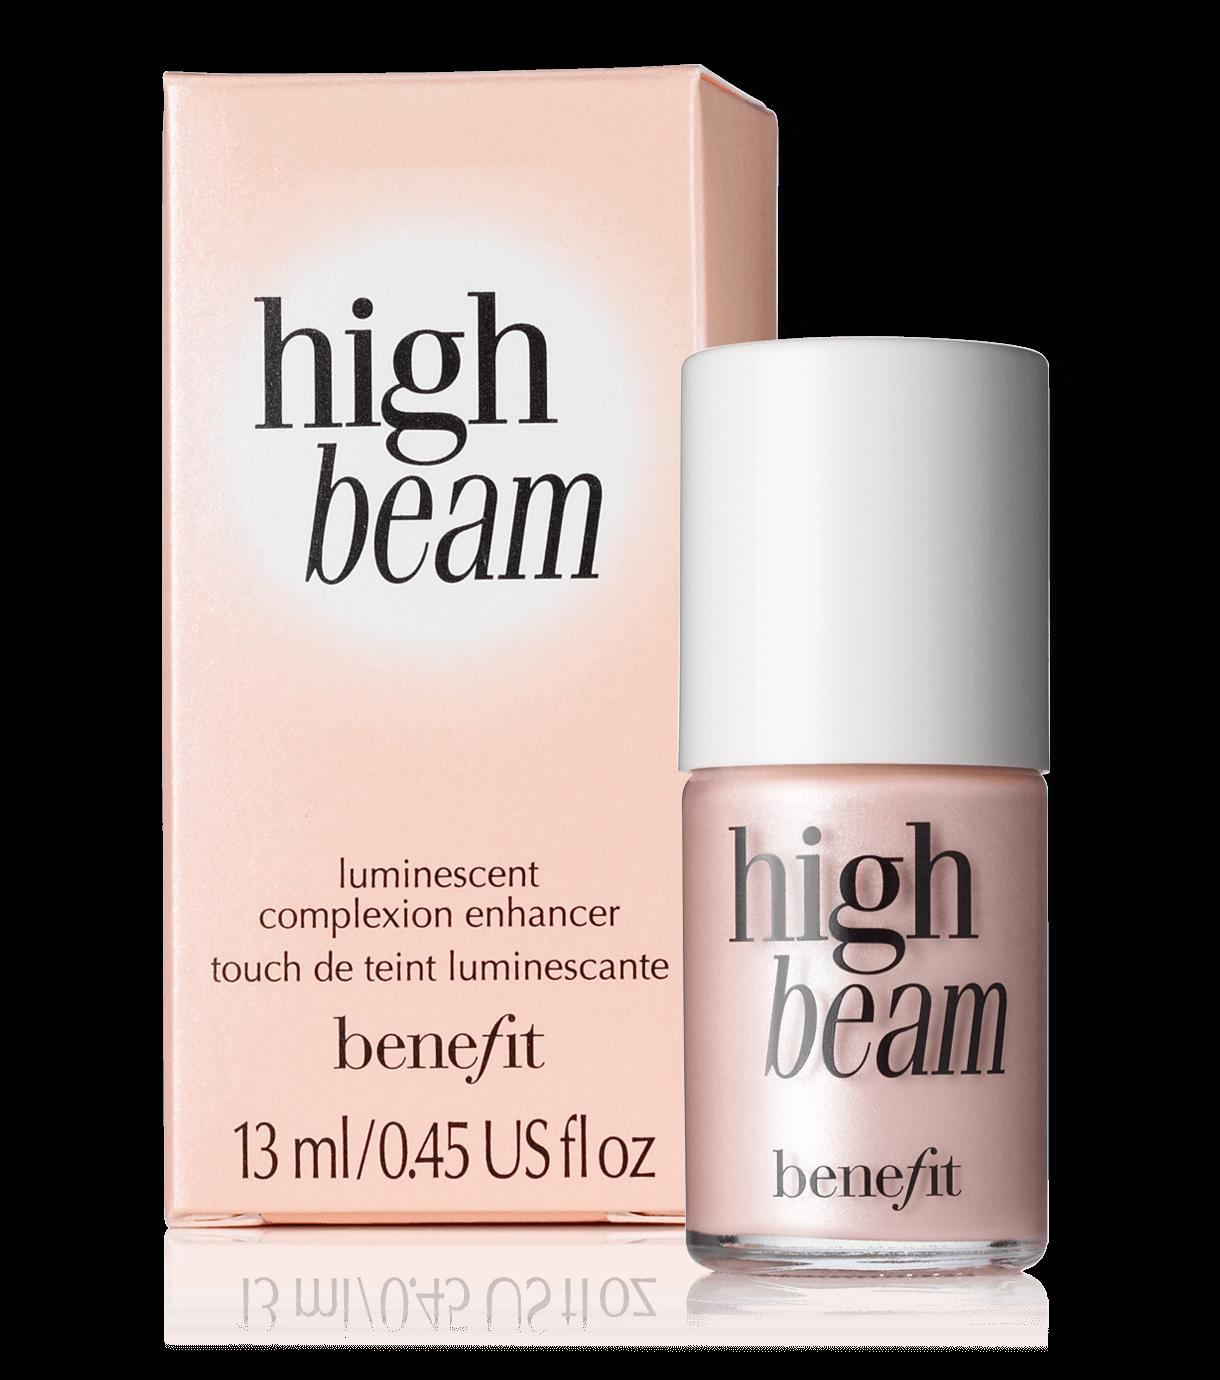 Beauty & Health Bronzers & Highlighters Ingenious Makeup Highlighter Cream Brightening Shimmer Makeup Liquid Set Professional Face Illuminator Shiny Gloss Bronze Long Lasting Elegant In Style